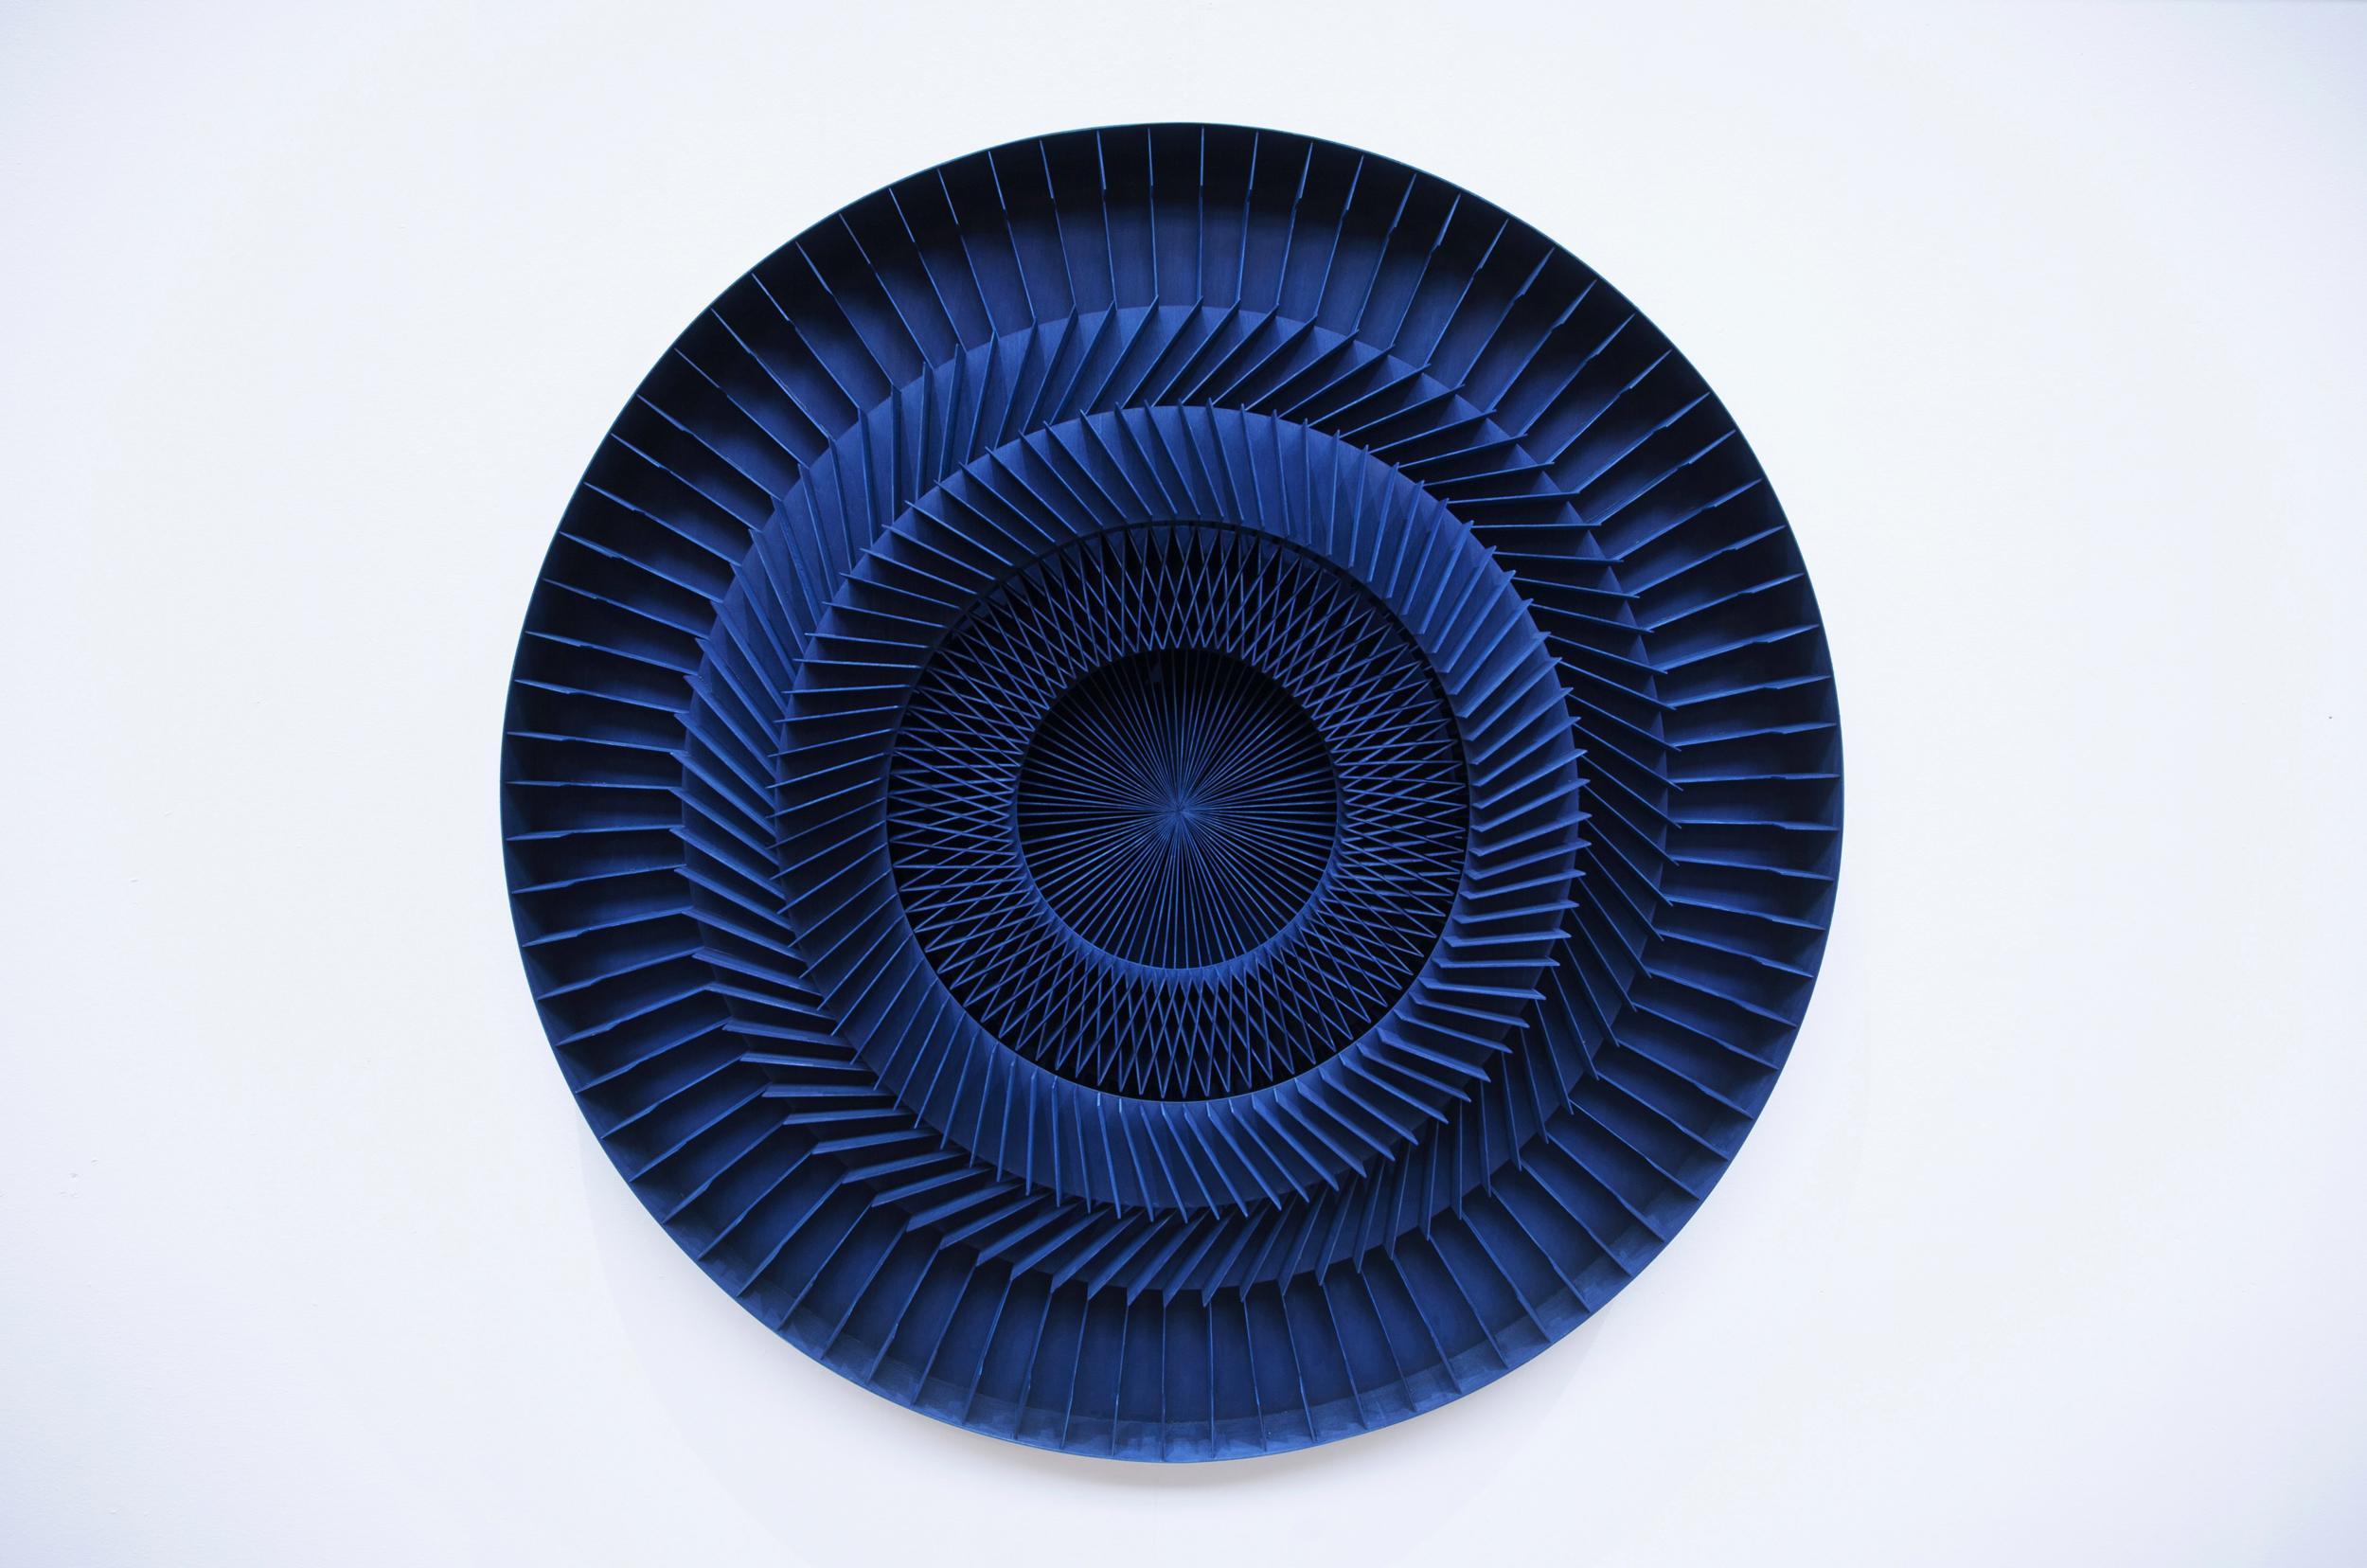 120 x 120cm, wood, cobalt ink, 2017